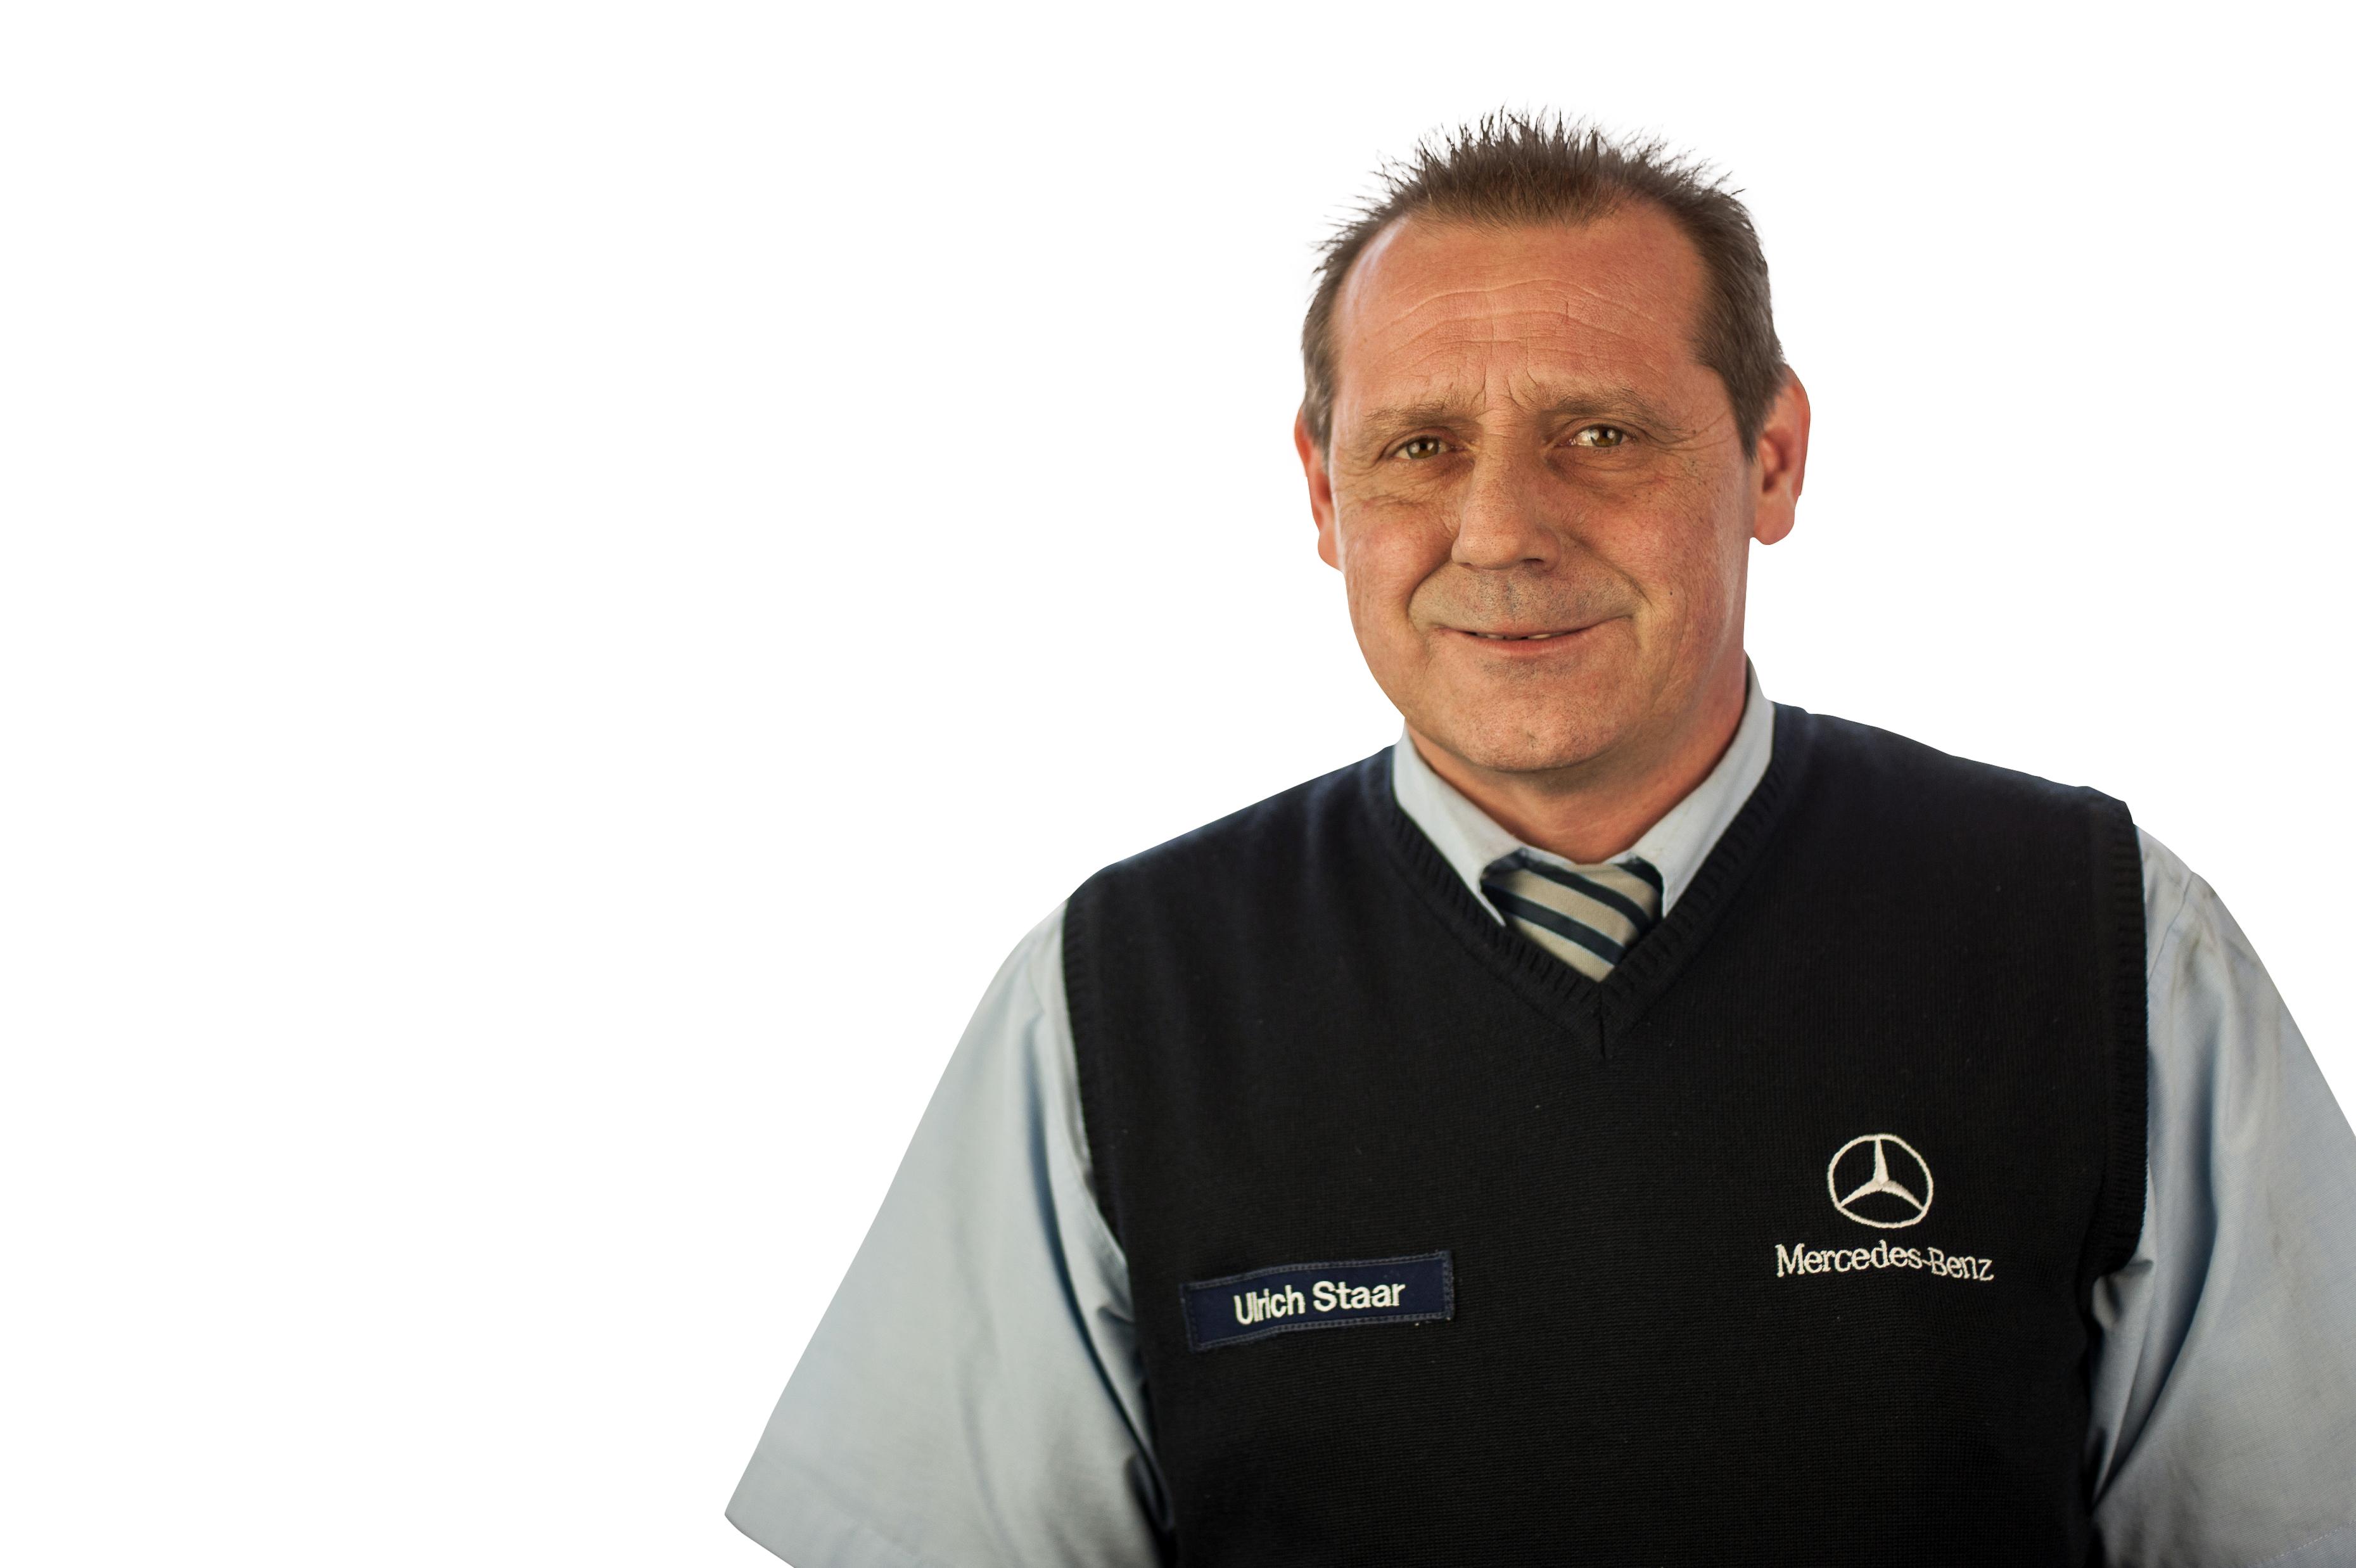 Ulrich Staar